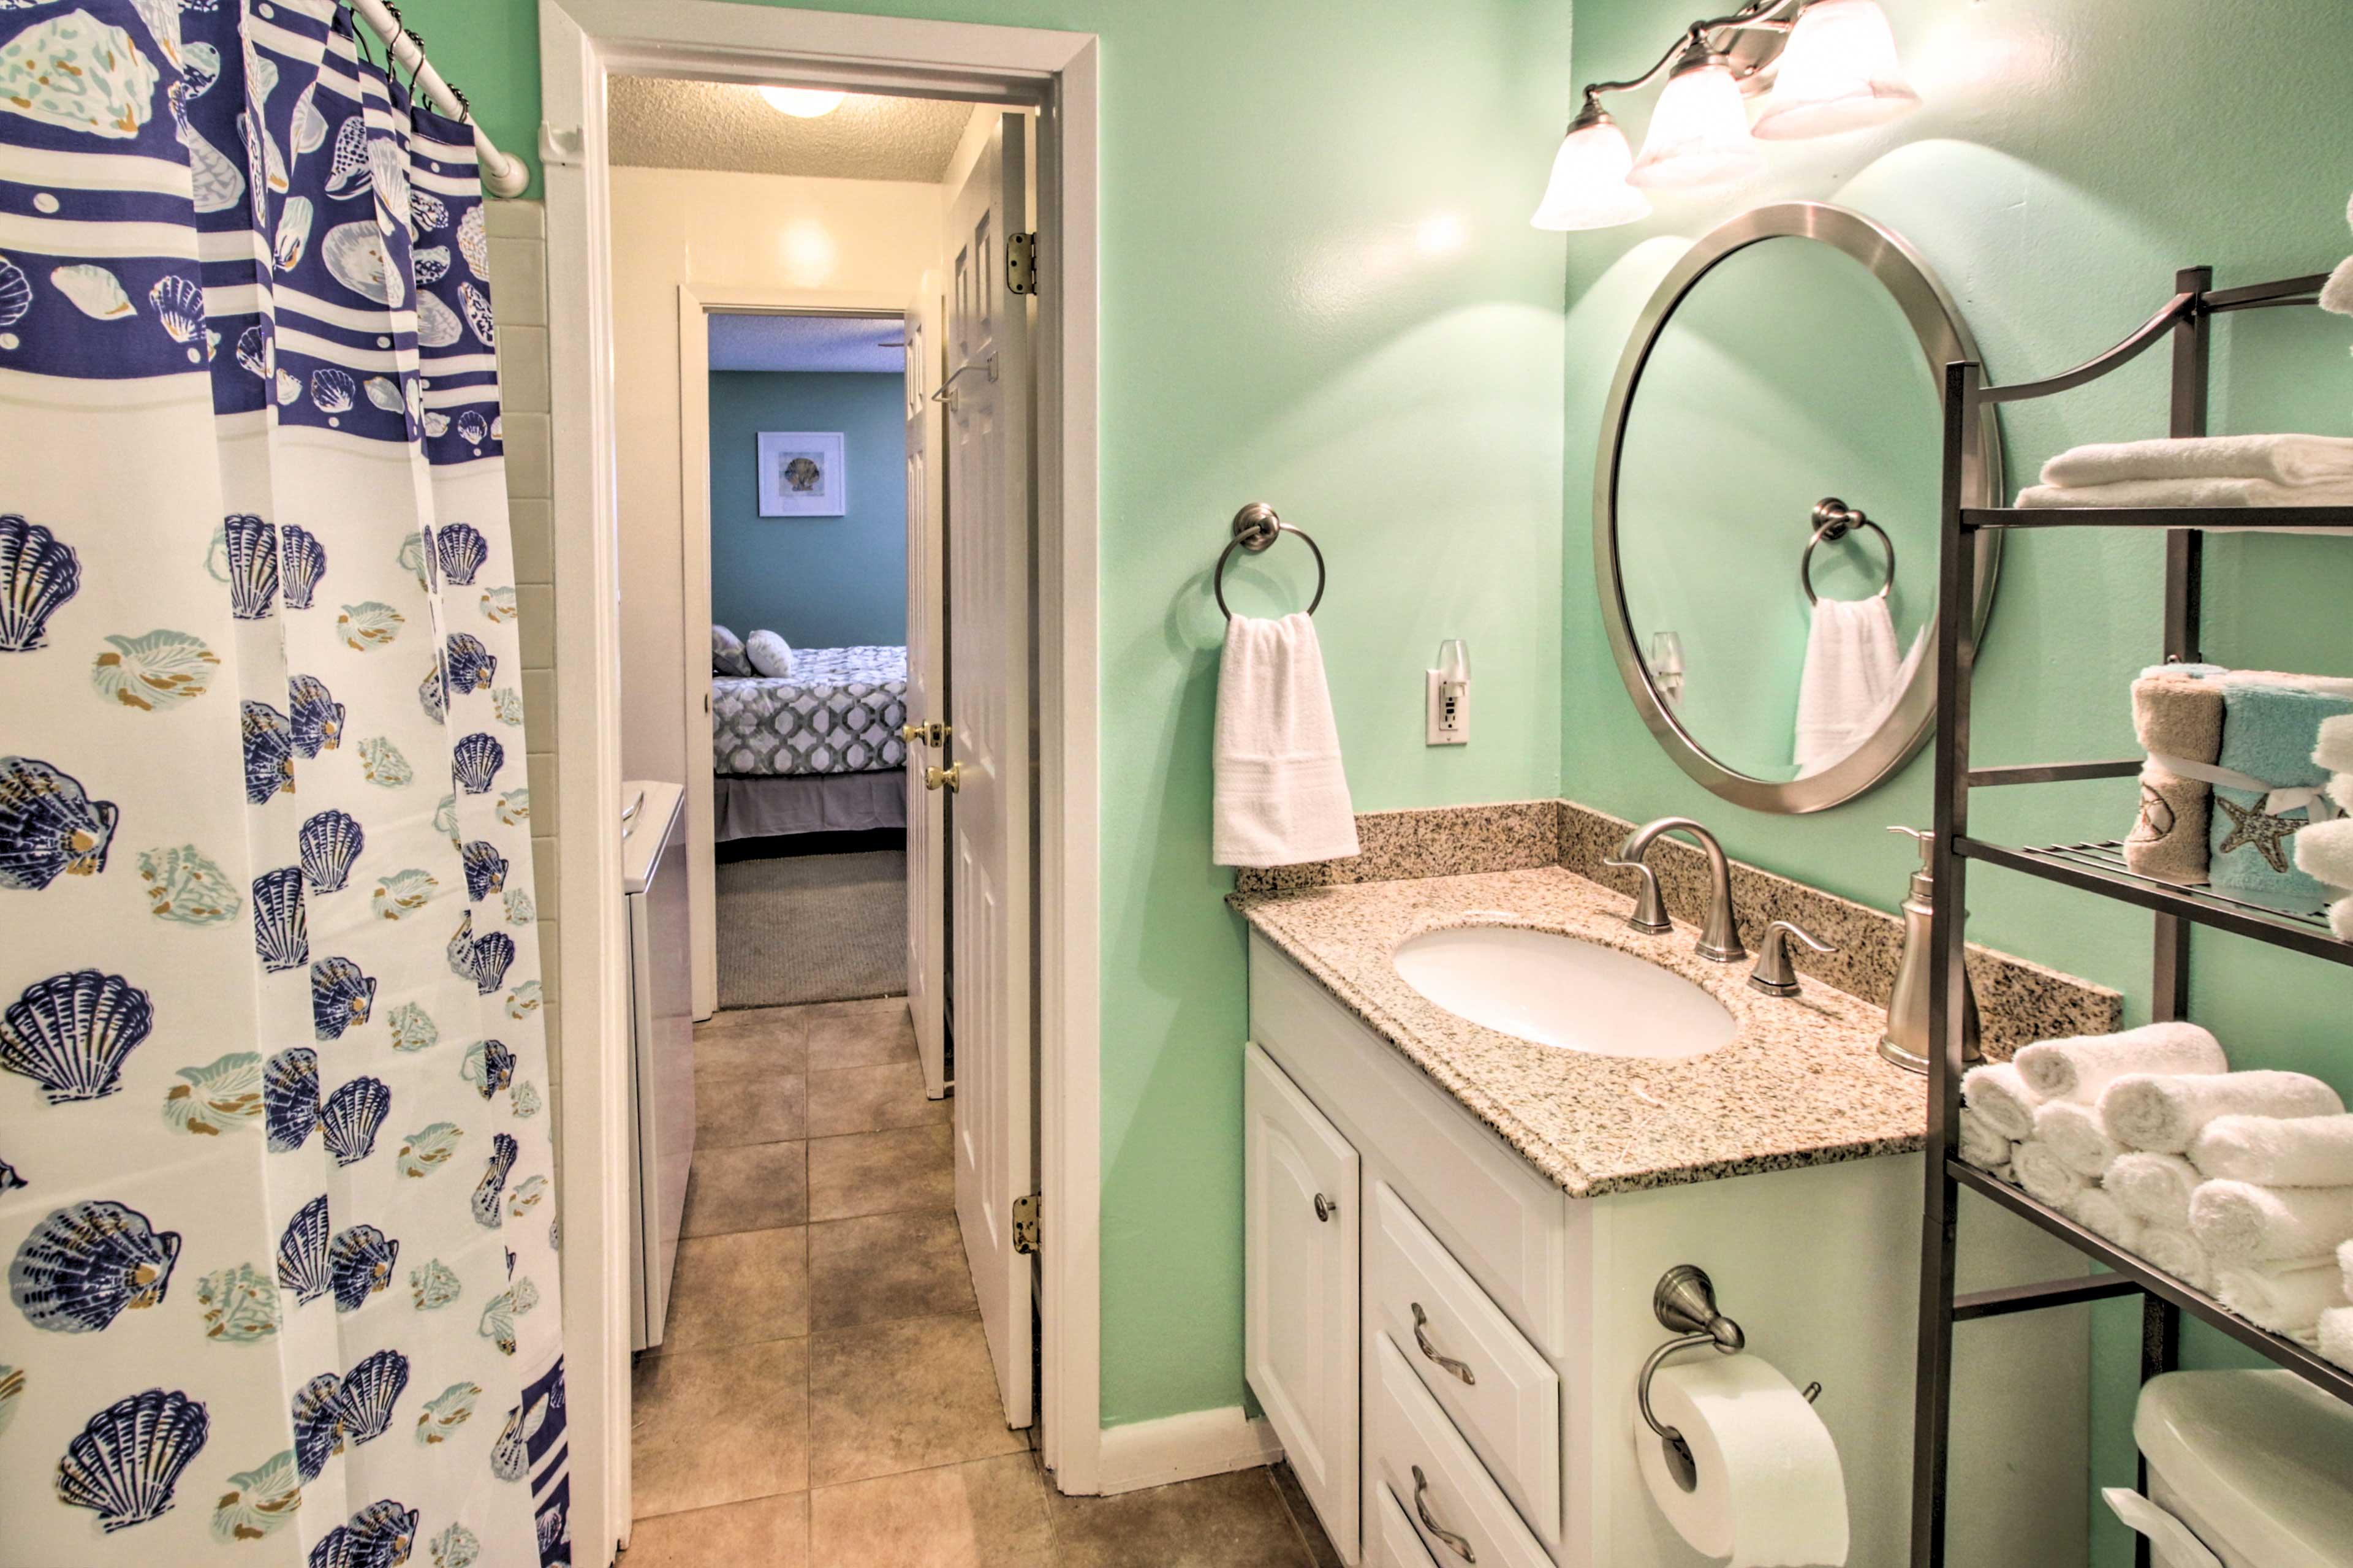 Jack-And-Jill Bathroom | Towels Provided